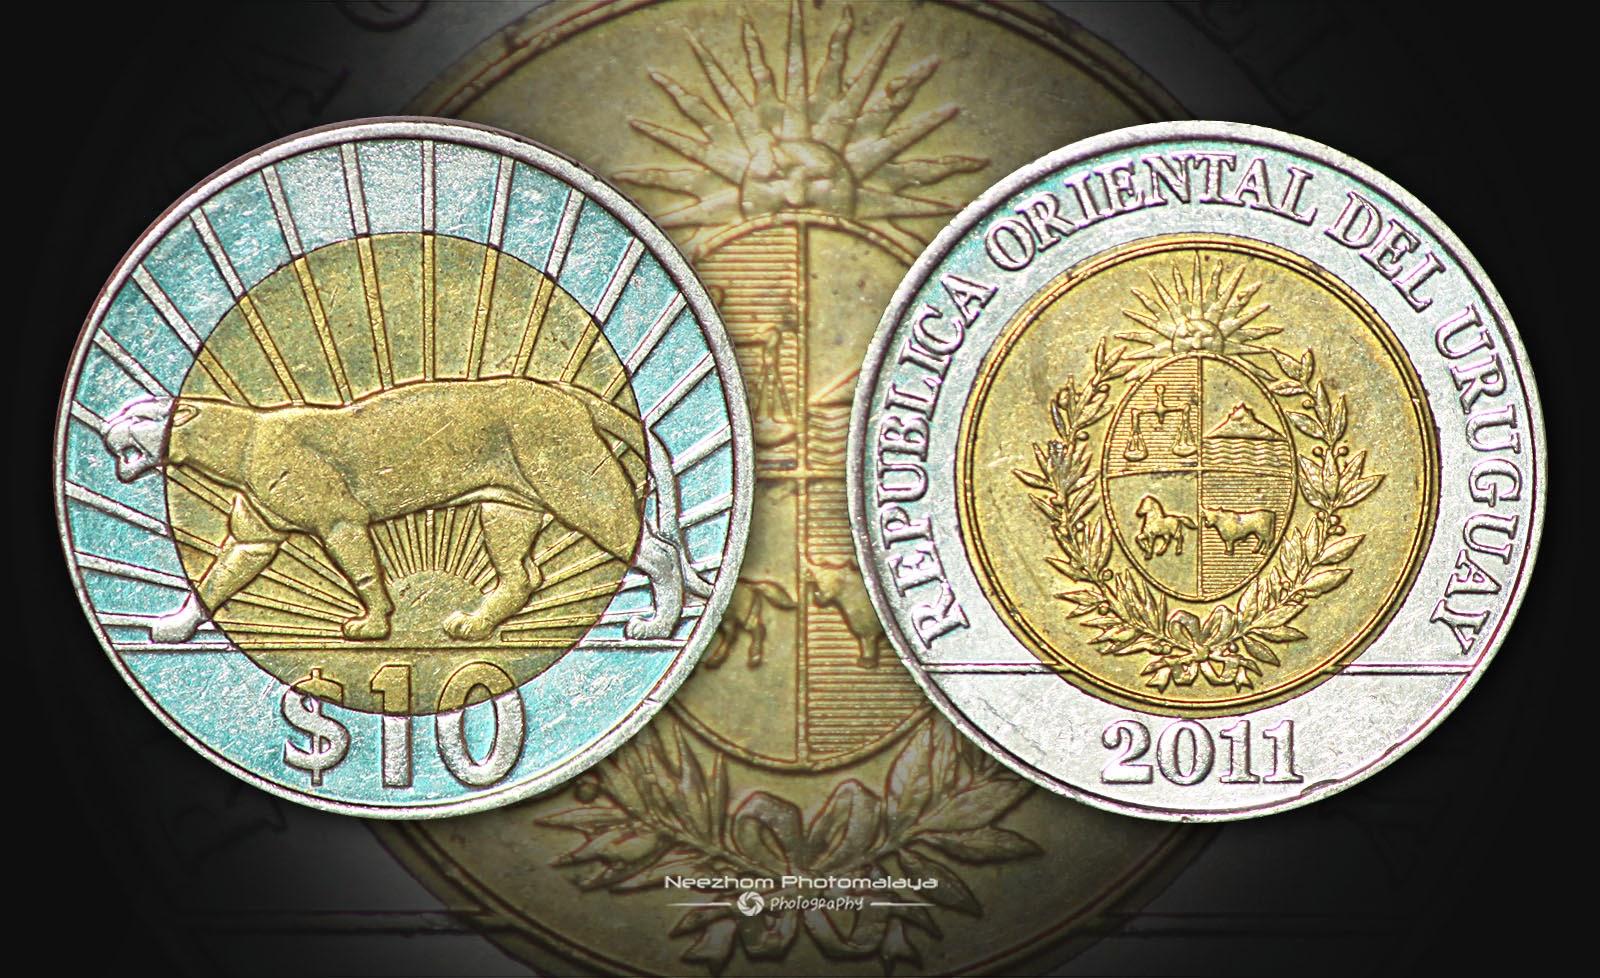 Uruguay 10 Pesos 2011 bimetal coin